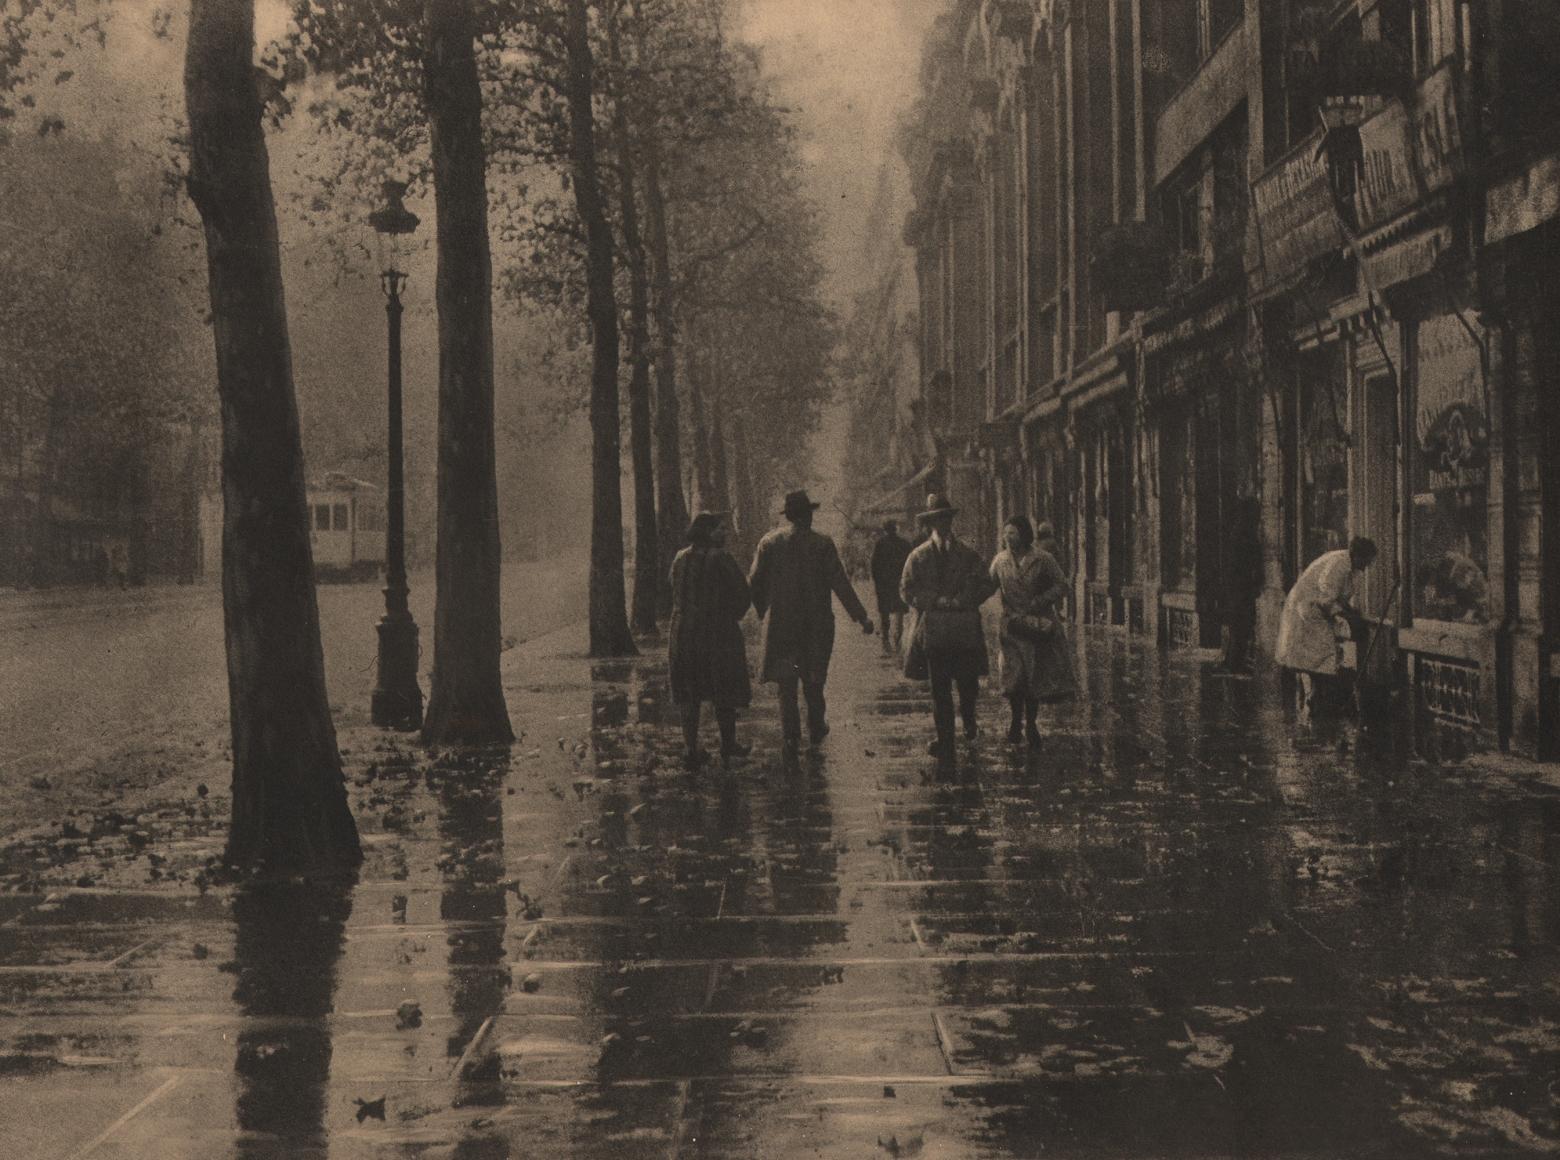 02. Léonard Misonne, Untitled, c. 1932. Pedestrians walk a tree-lined, wet sidewalk. Sepia-toned print.